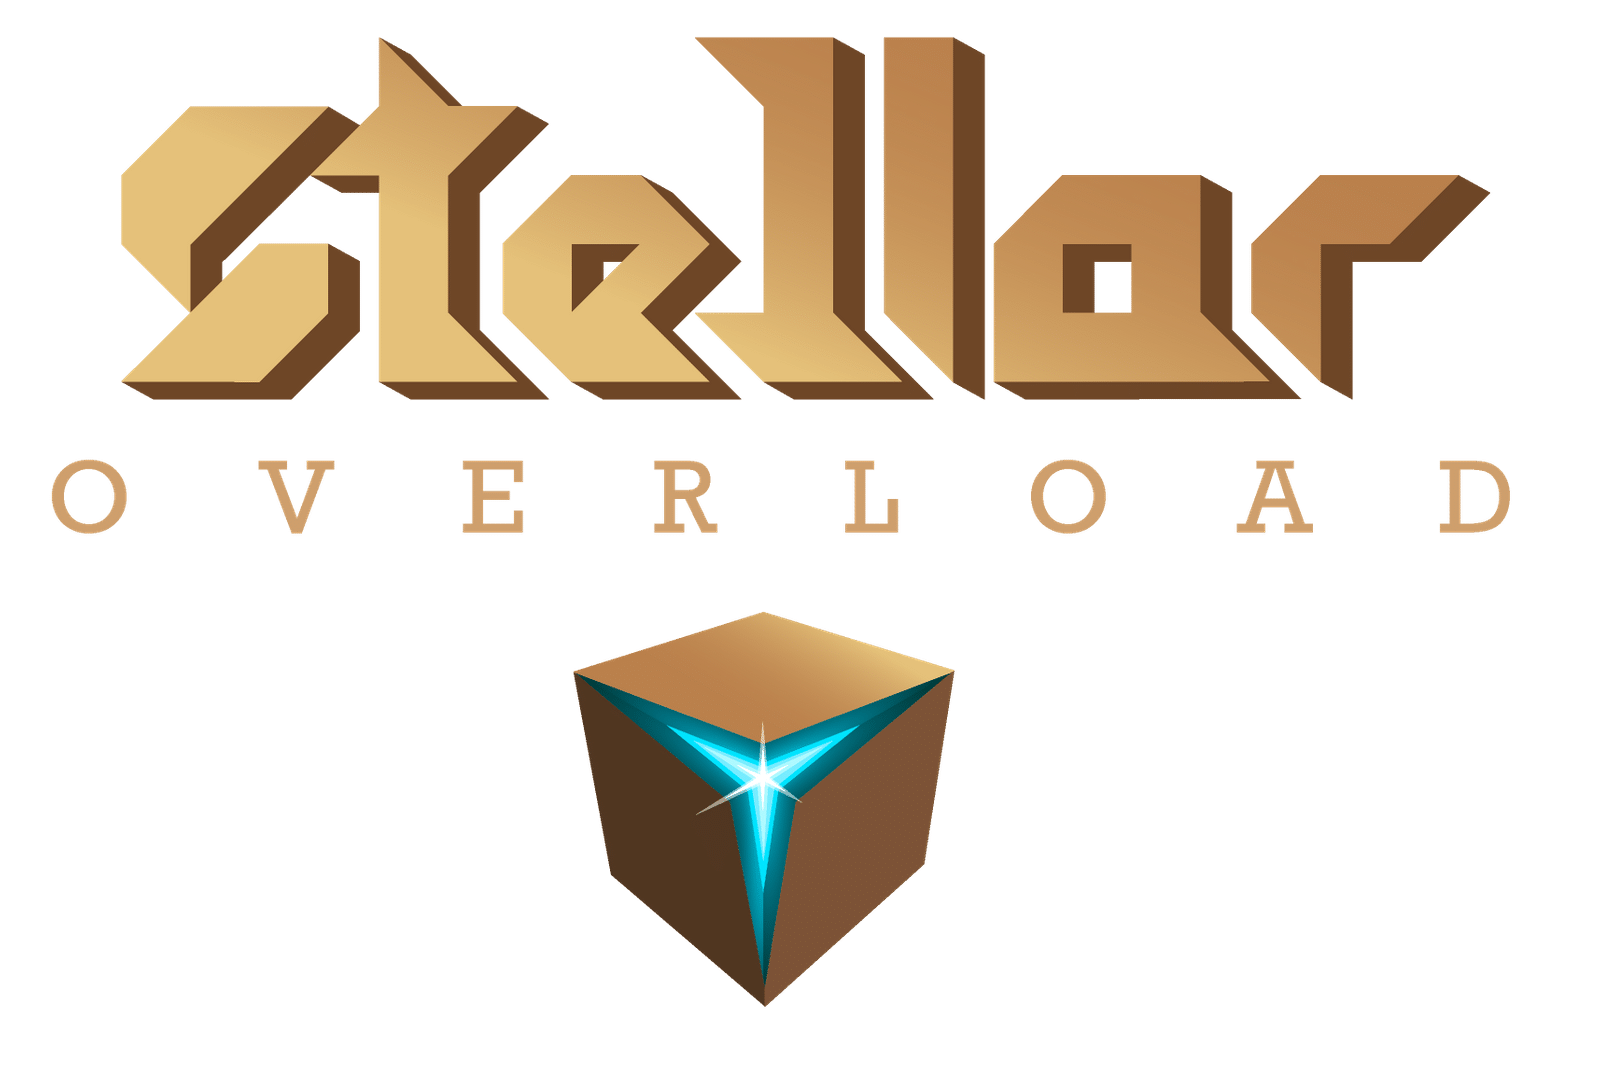 buy Stellar Overload cd key for all platform